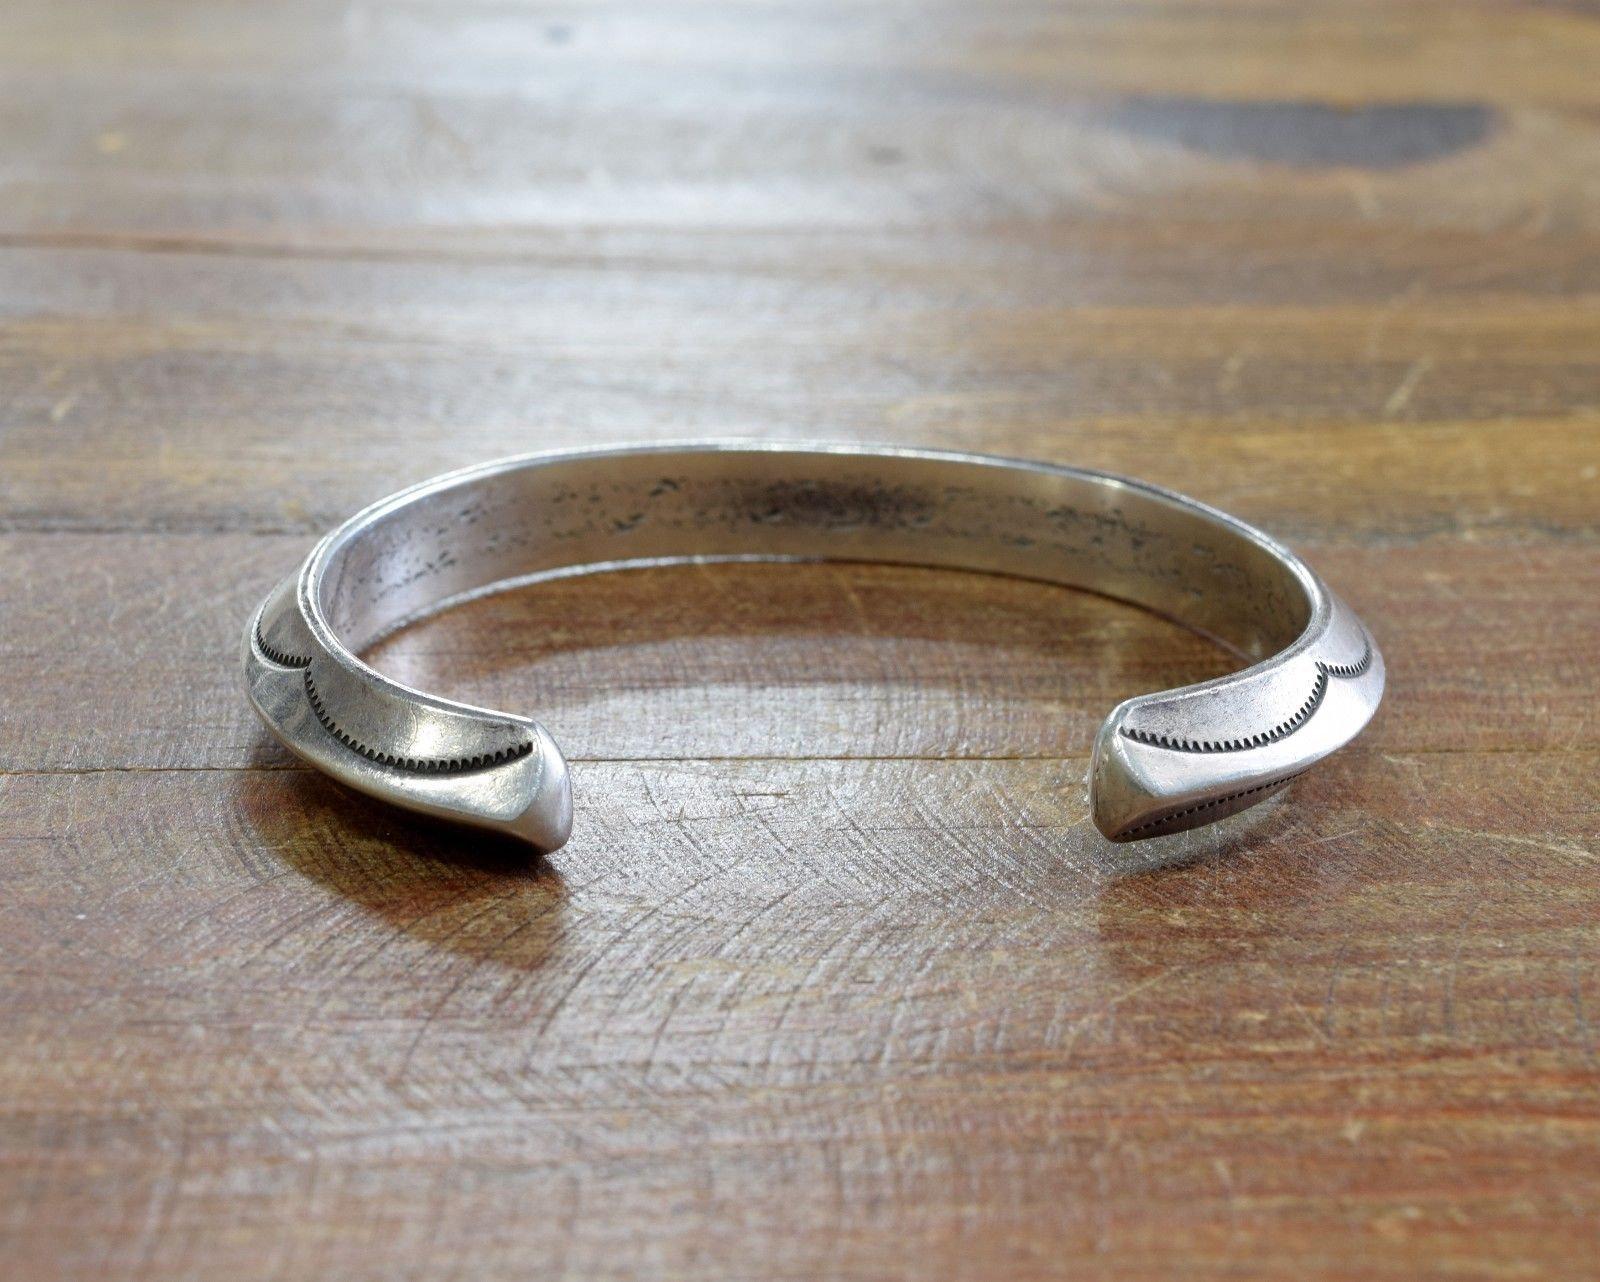 Vintage Southwestern Sterling Silver Triangle Wire Cuff Bracelet 7 25